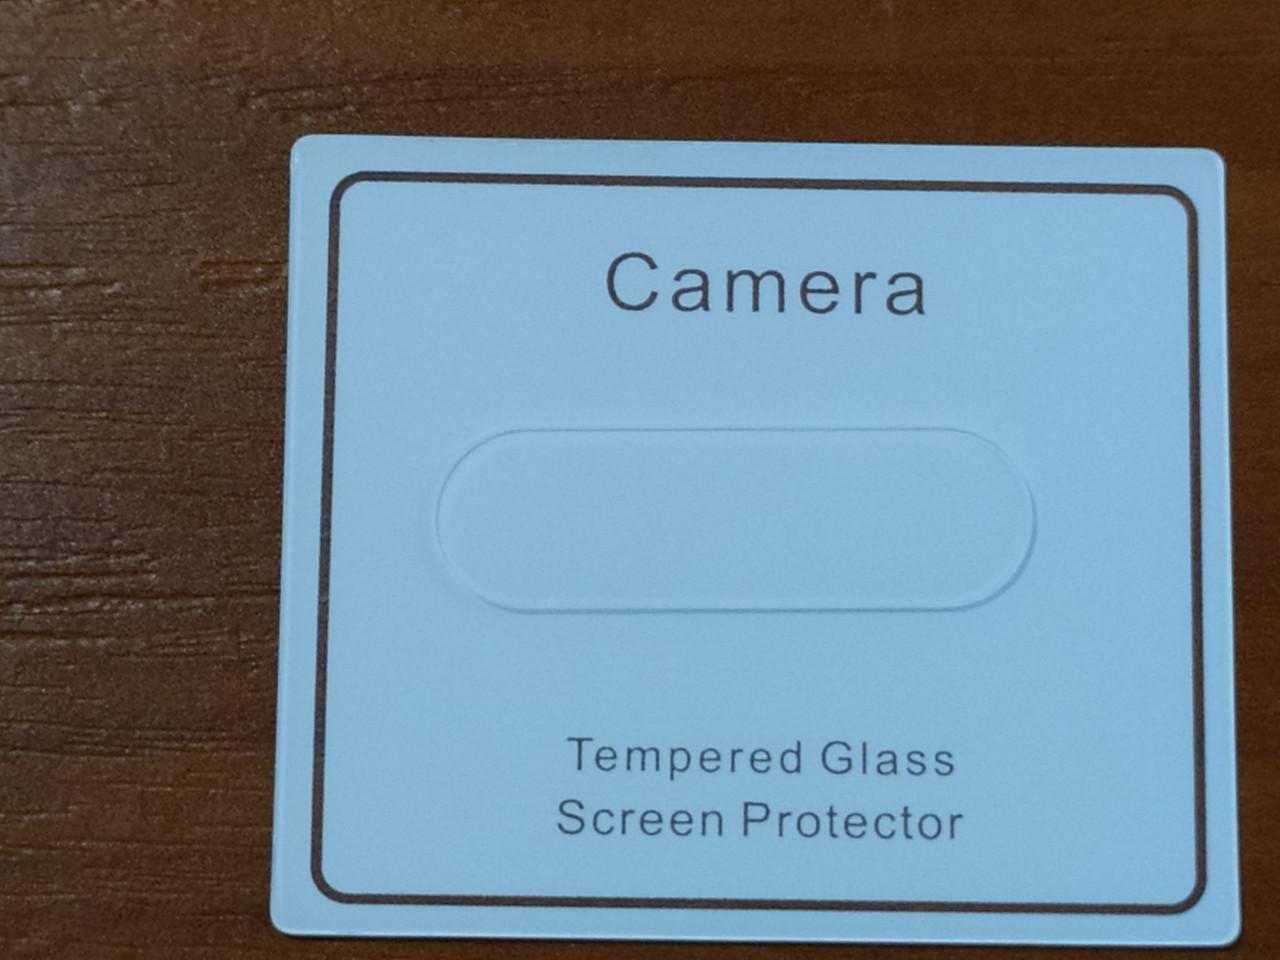 Захисне скло на камеру Tempered Glass Screen Protector Xiaomi Redmi 9